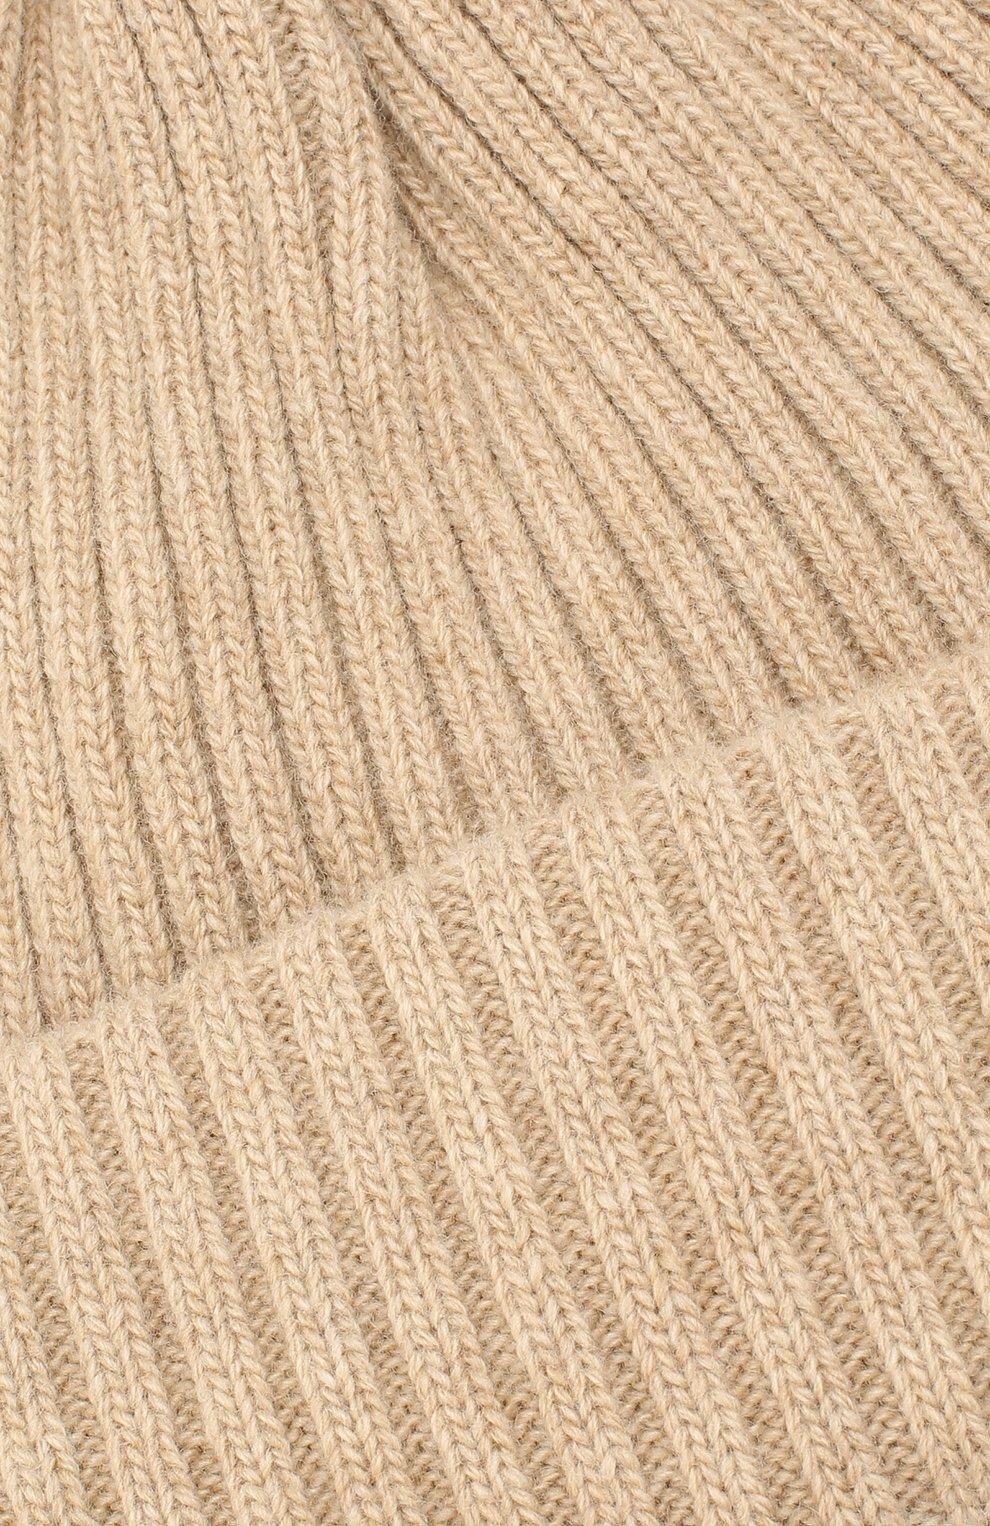 Мужская шерстяная шапка BURBERRY бежевого цвета, арт. 8021812 | Фото 3